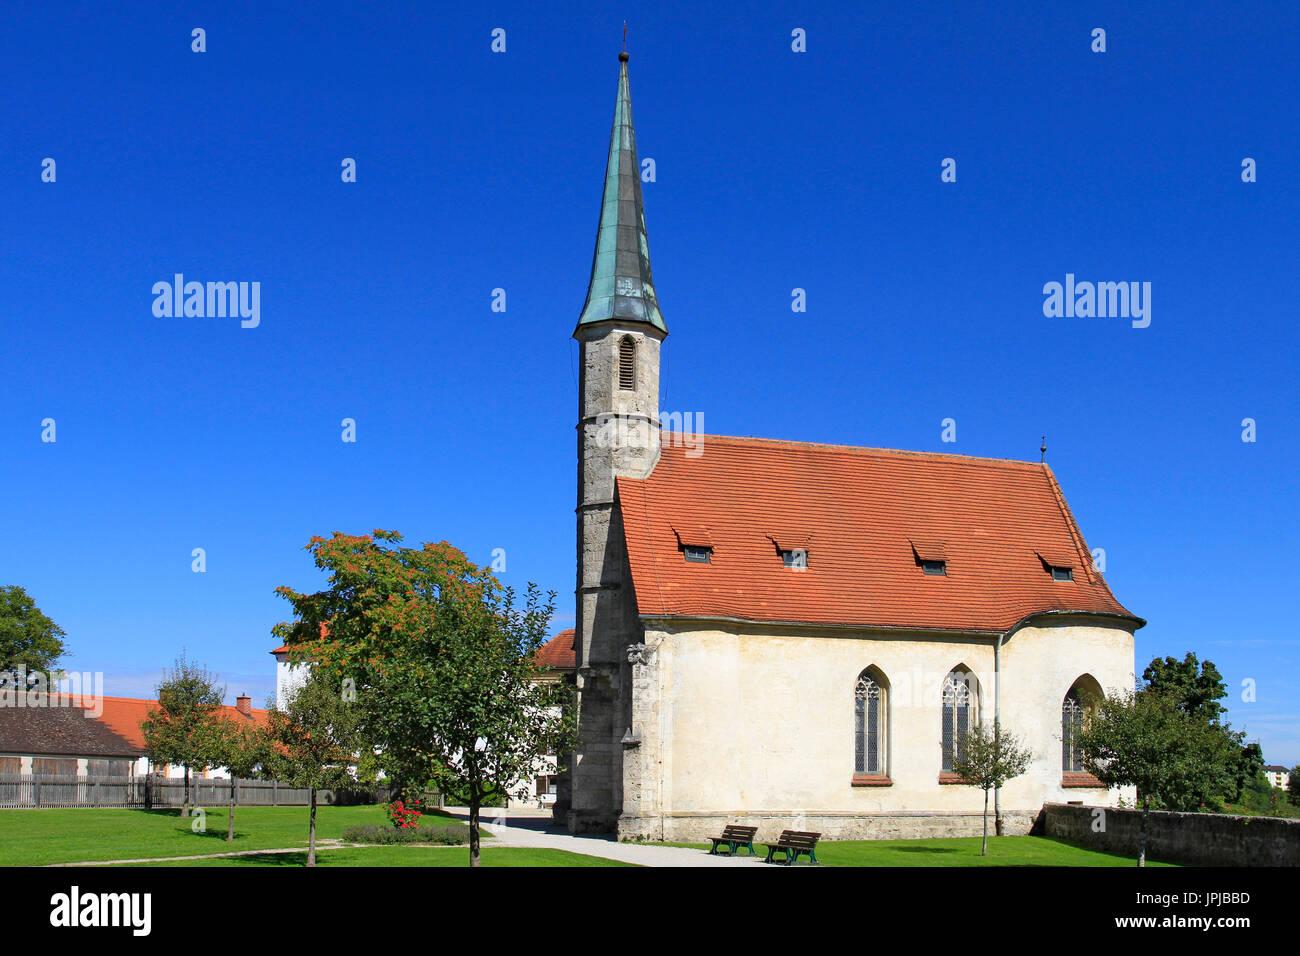 Castle Chapel at the Burg zu Burghausen Castle, Burghausen, Upper Bavaria, Bavaria, Germany, Europe - Stock Image